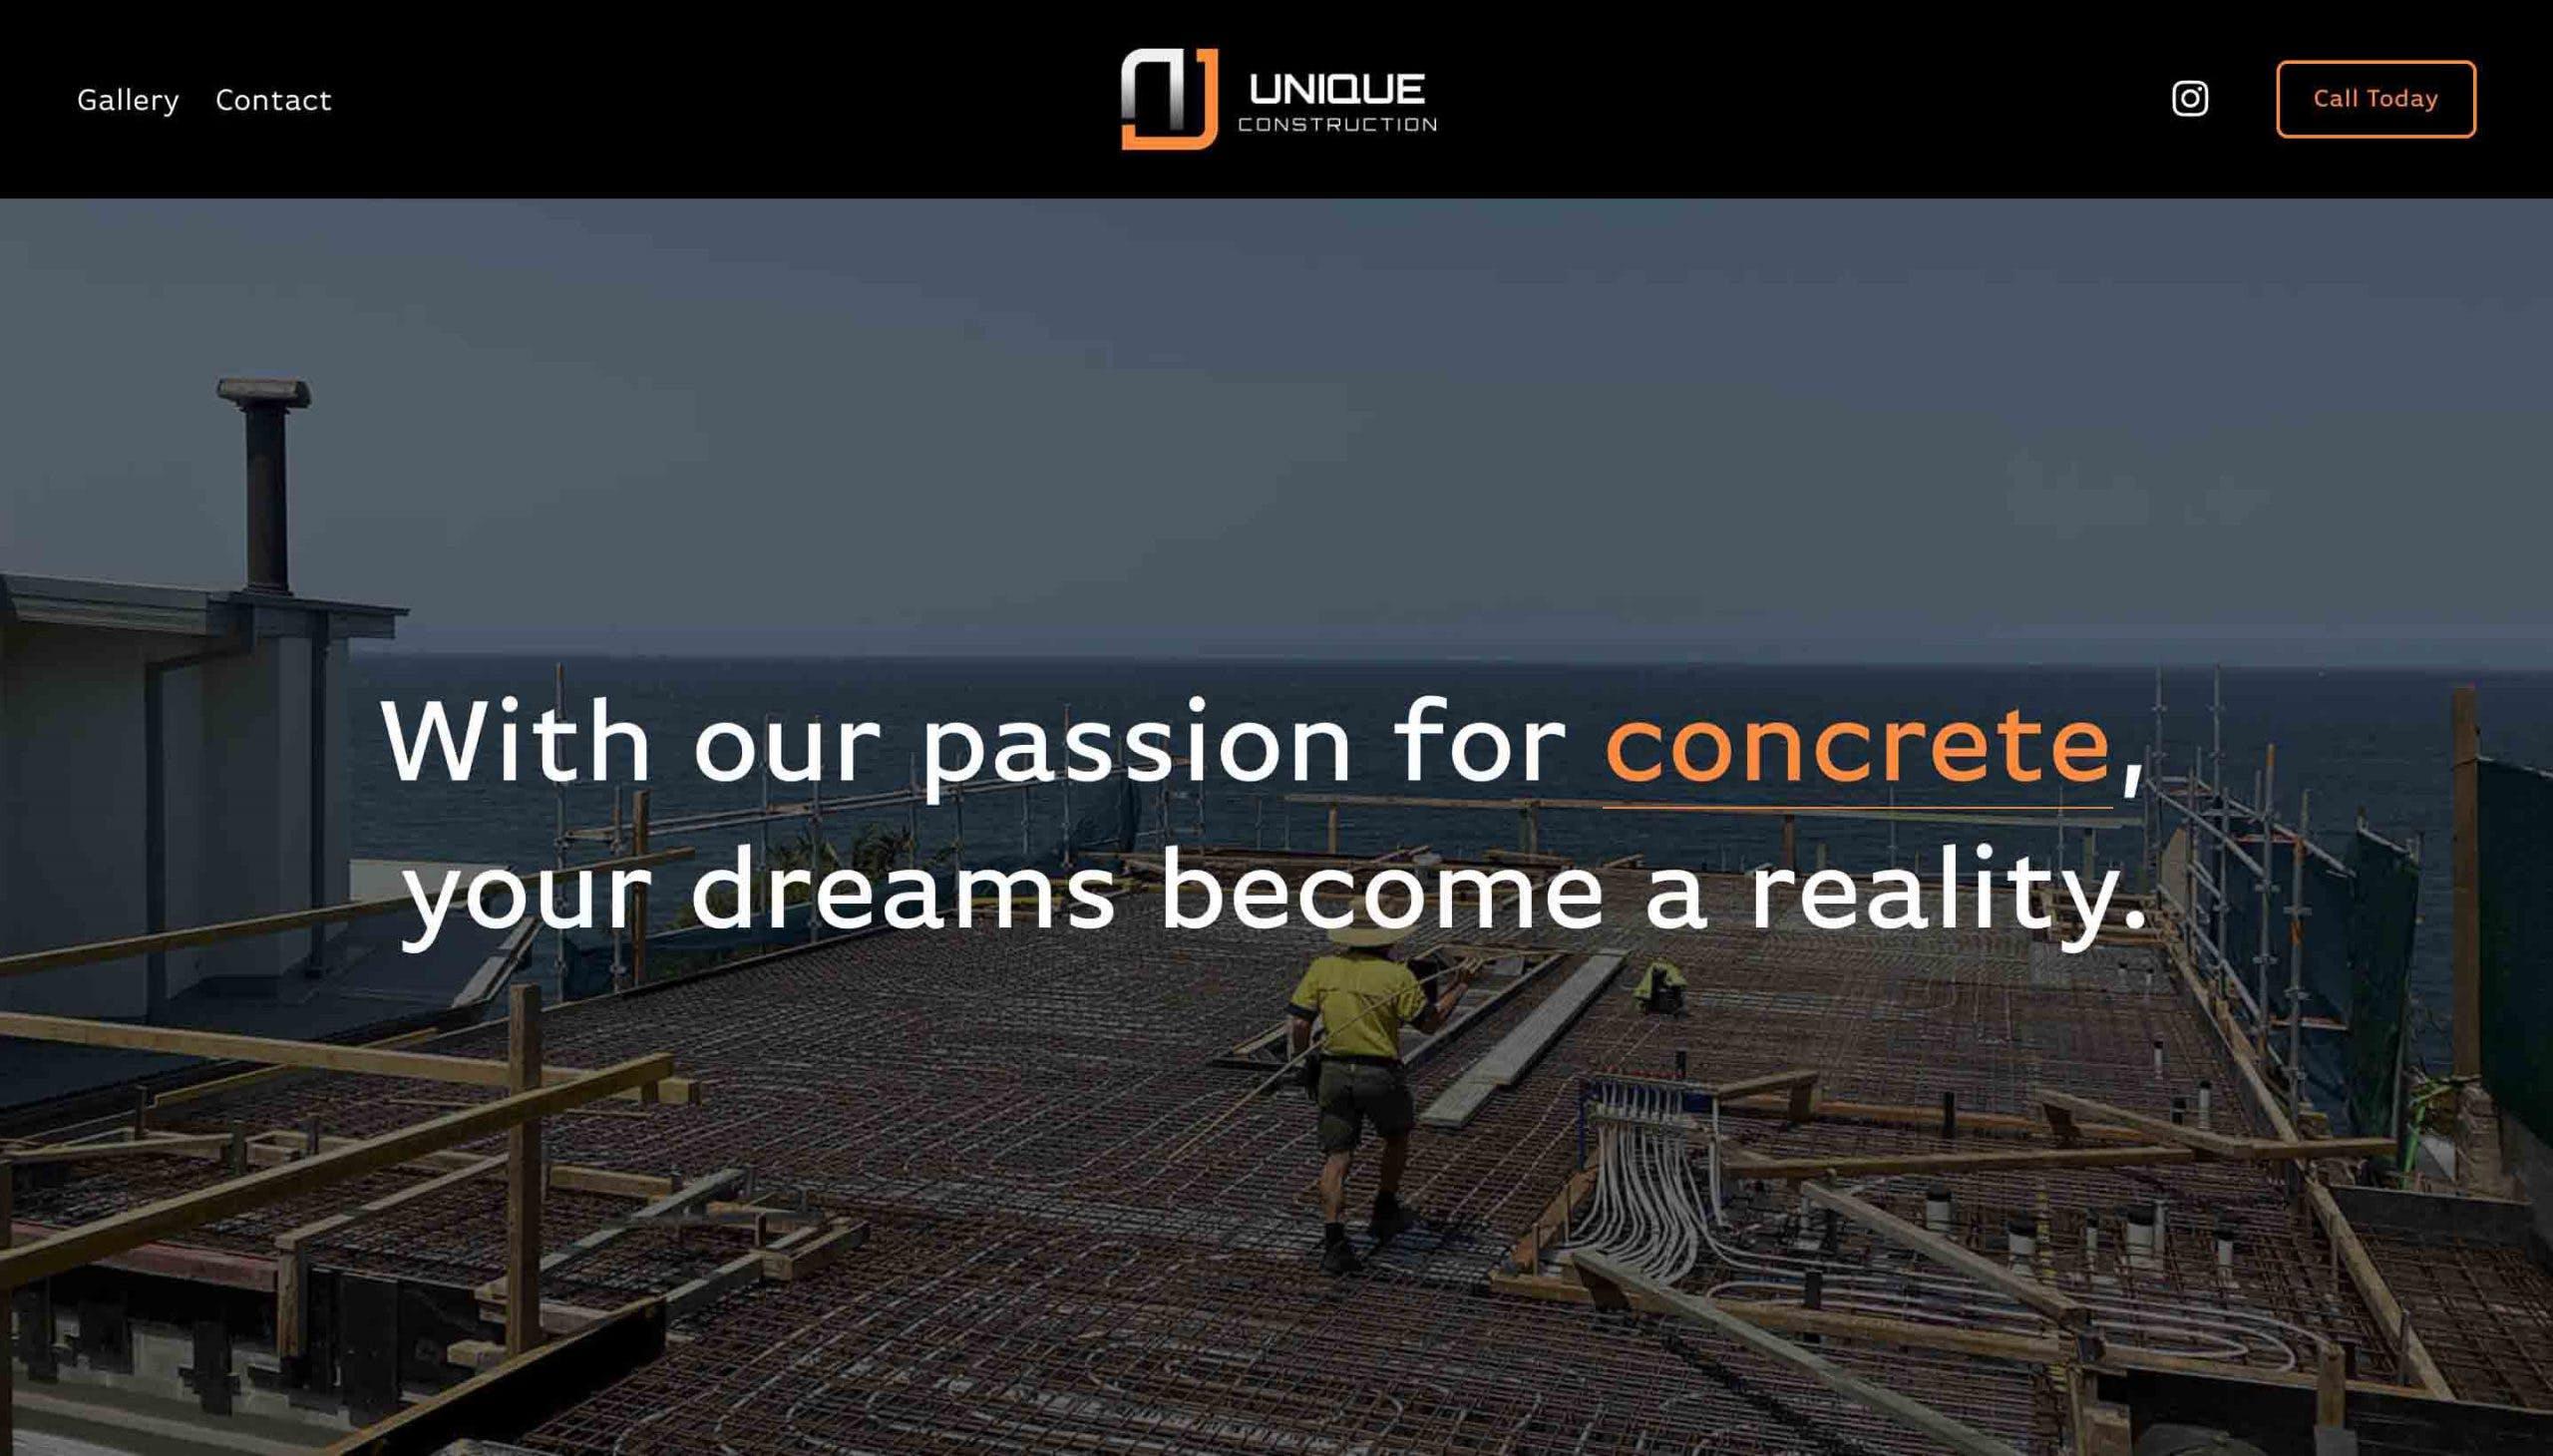 unique construction screen shot scaled.jpg?auto=format%2Ccompress&ixlib=php 3.3